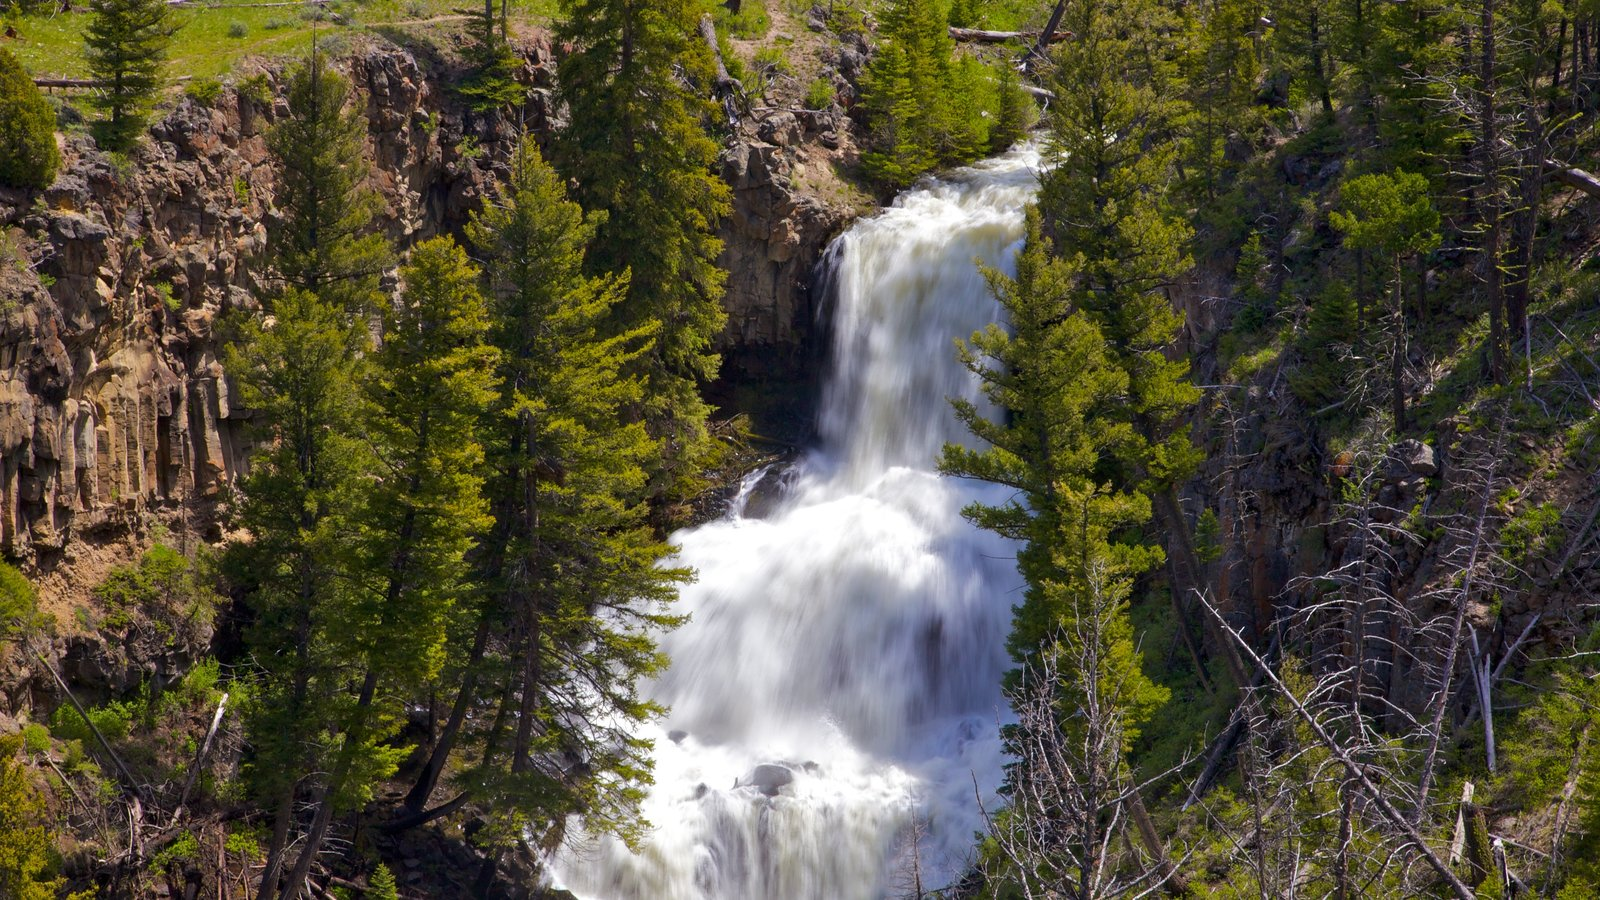 Yellowstone National Park caracterizando uma cascata e cenas de floresta